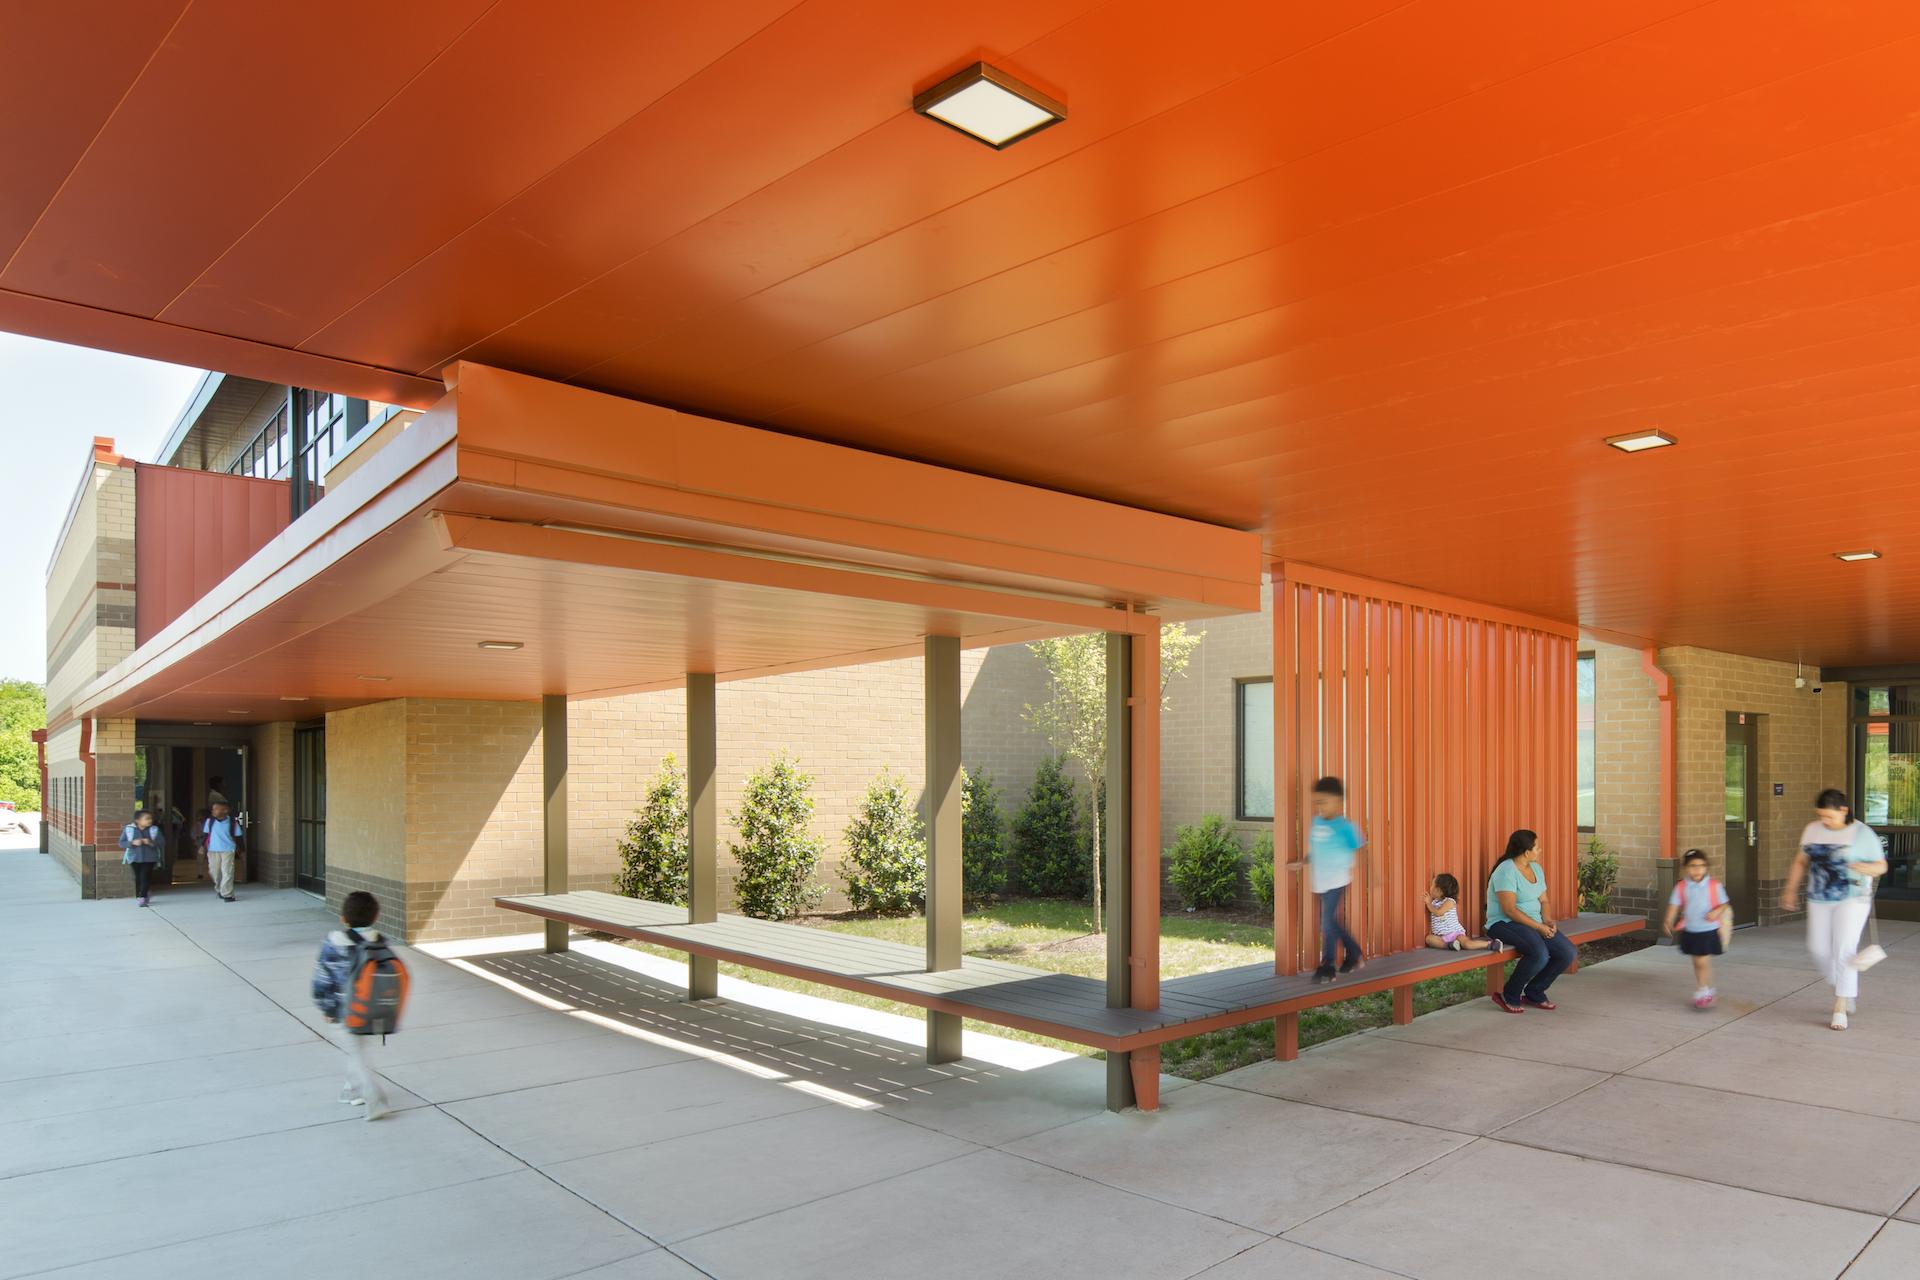 Eagle View Elementary School